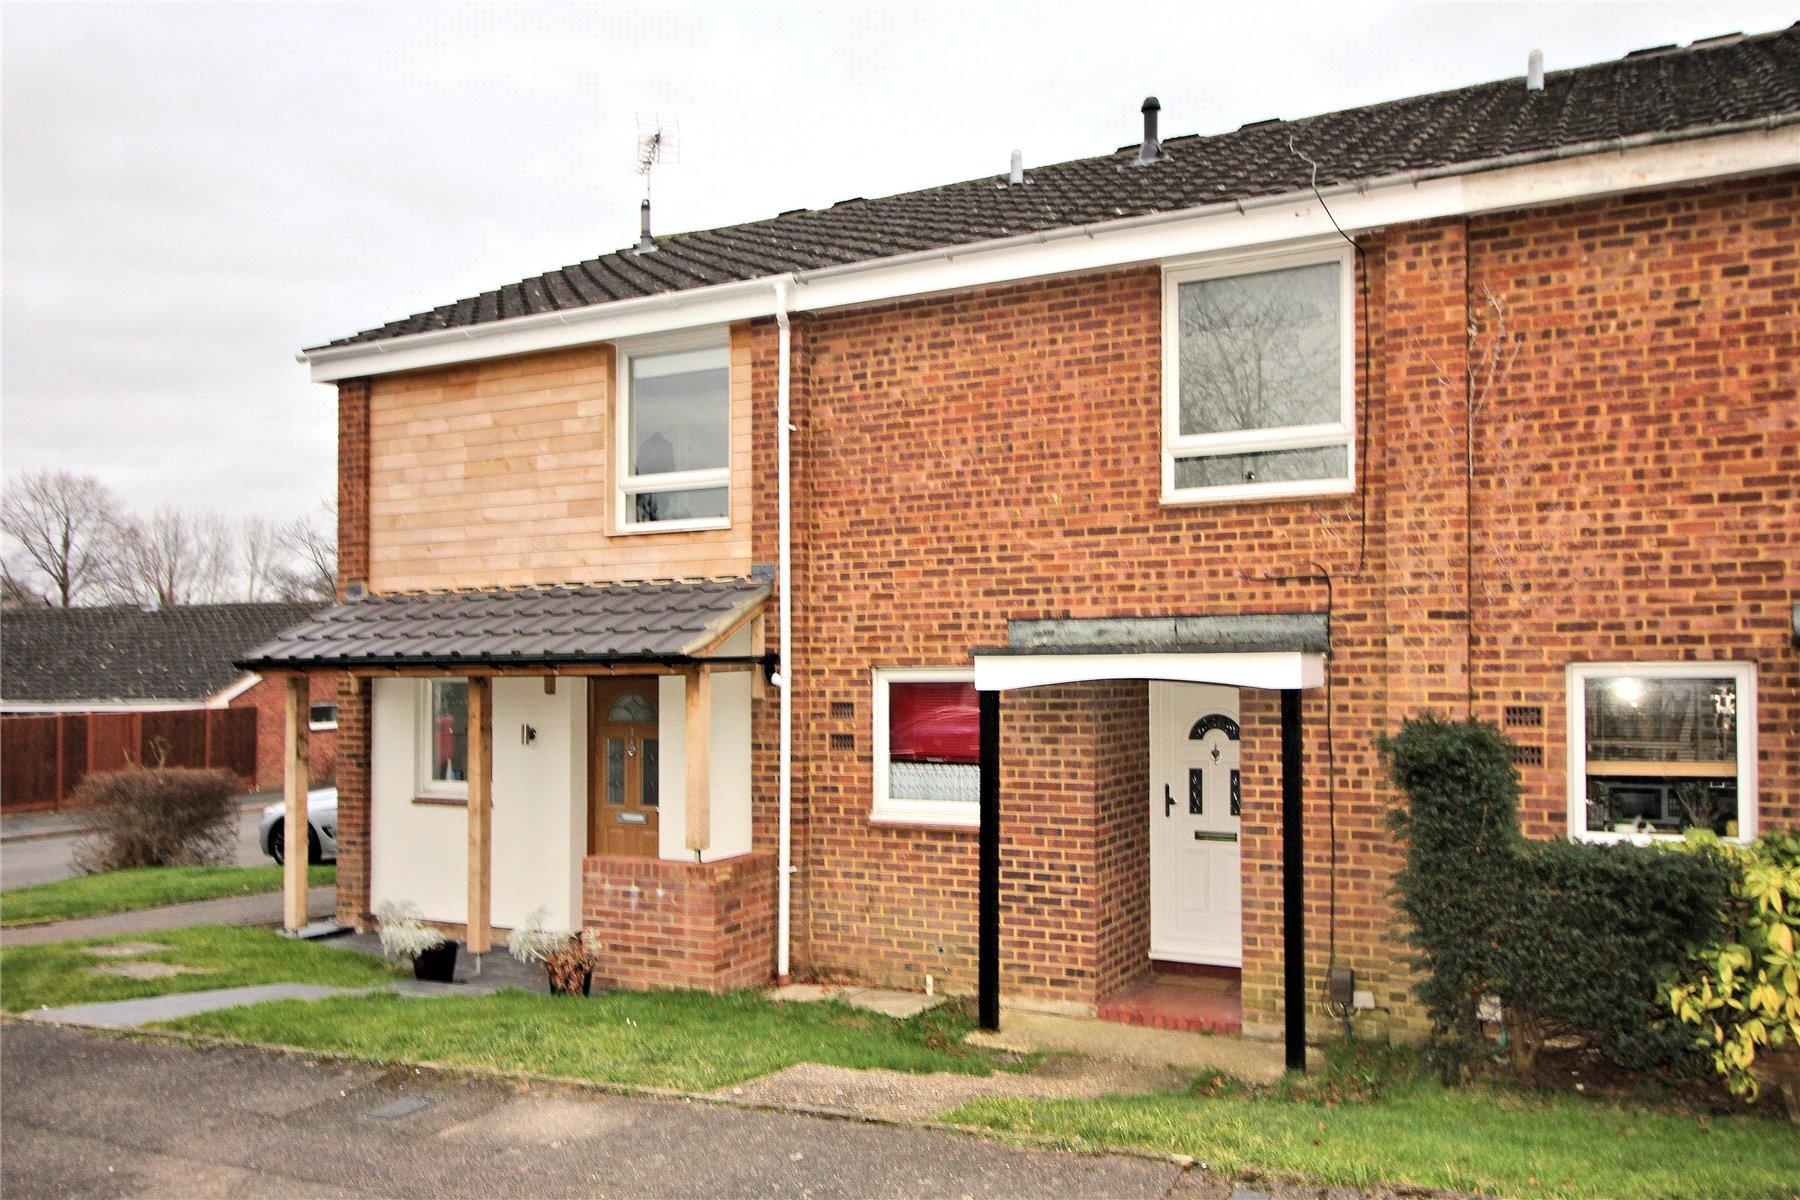 3 Bedrooms Terraced House for sale in Choir Green, Knaphill, Woking, Surrey, GU21